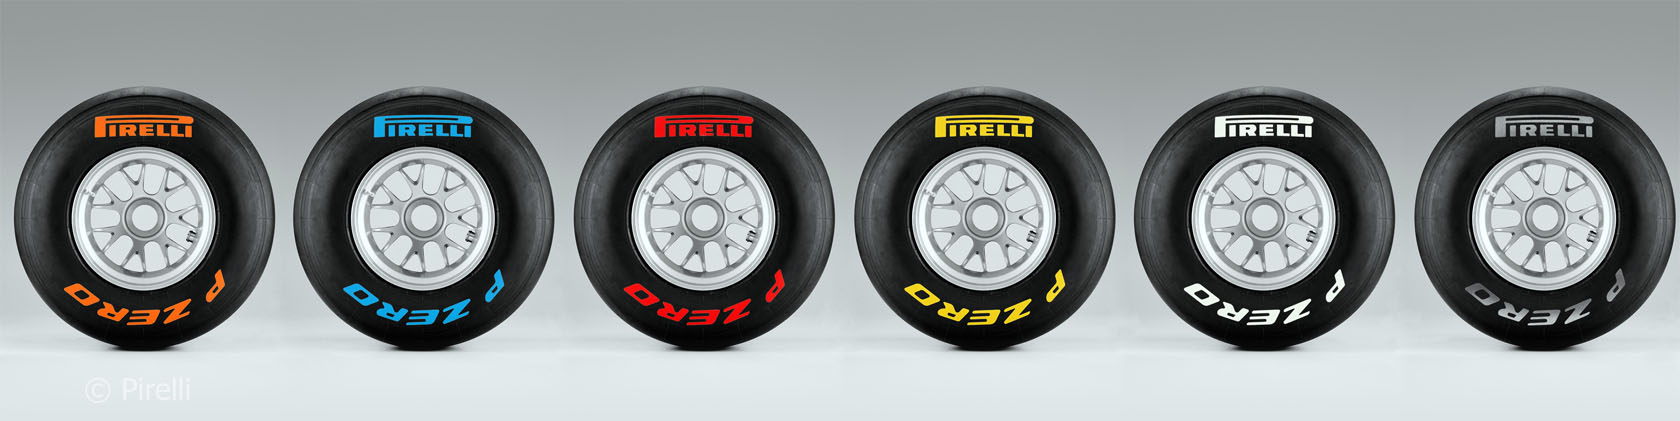 pirelli_tyres